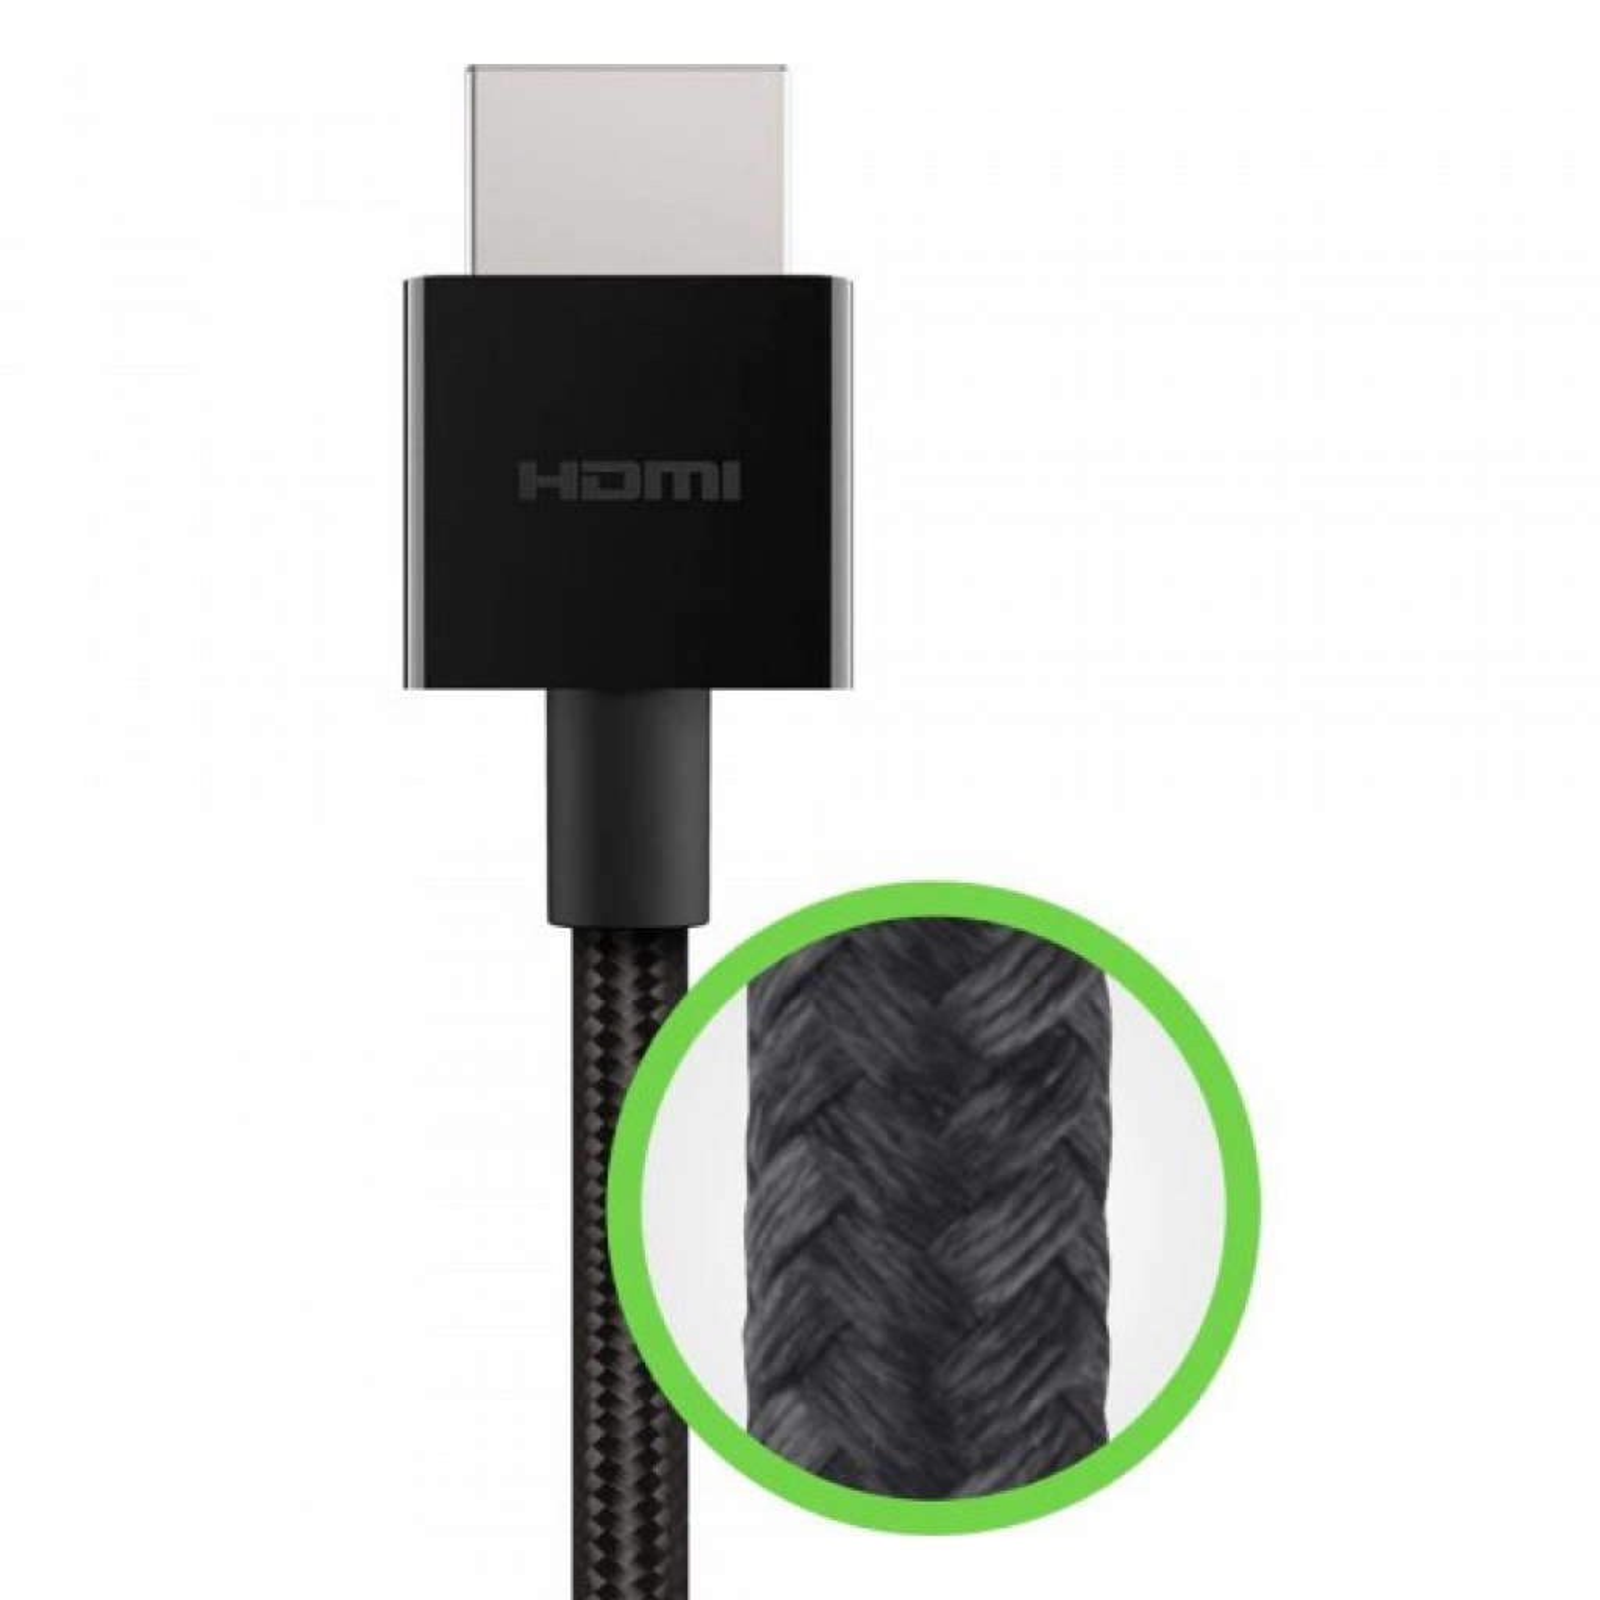 Кабель мультимедийный HDMI to HDMI 1.0m V2.1 Belkin (AV10176BT1M-BLK) изображение 2